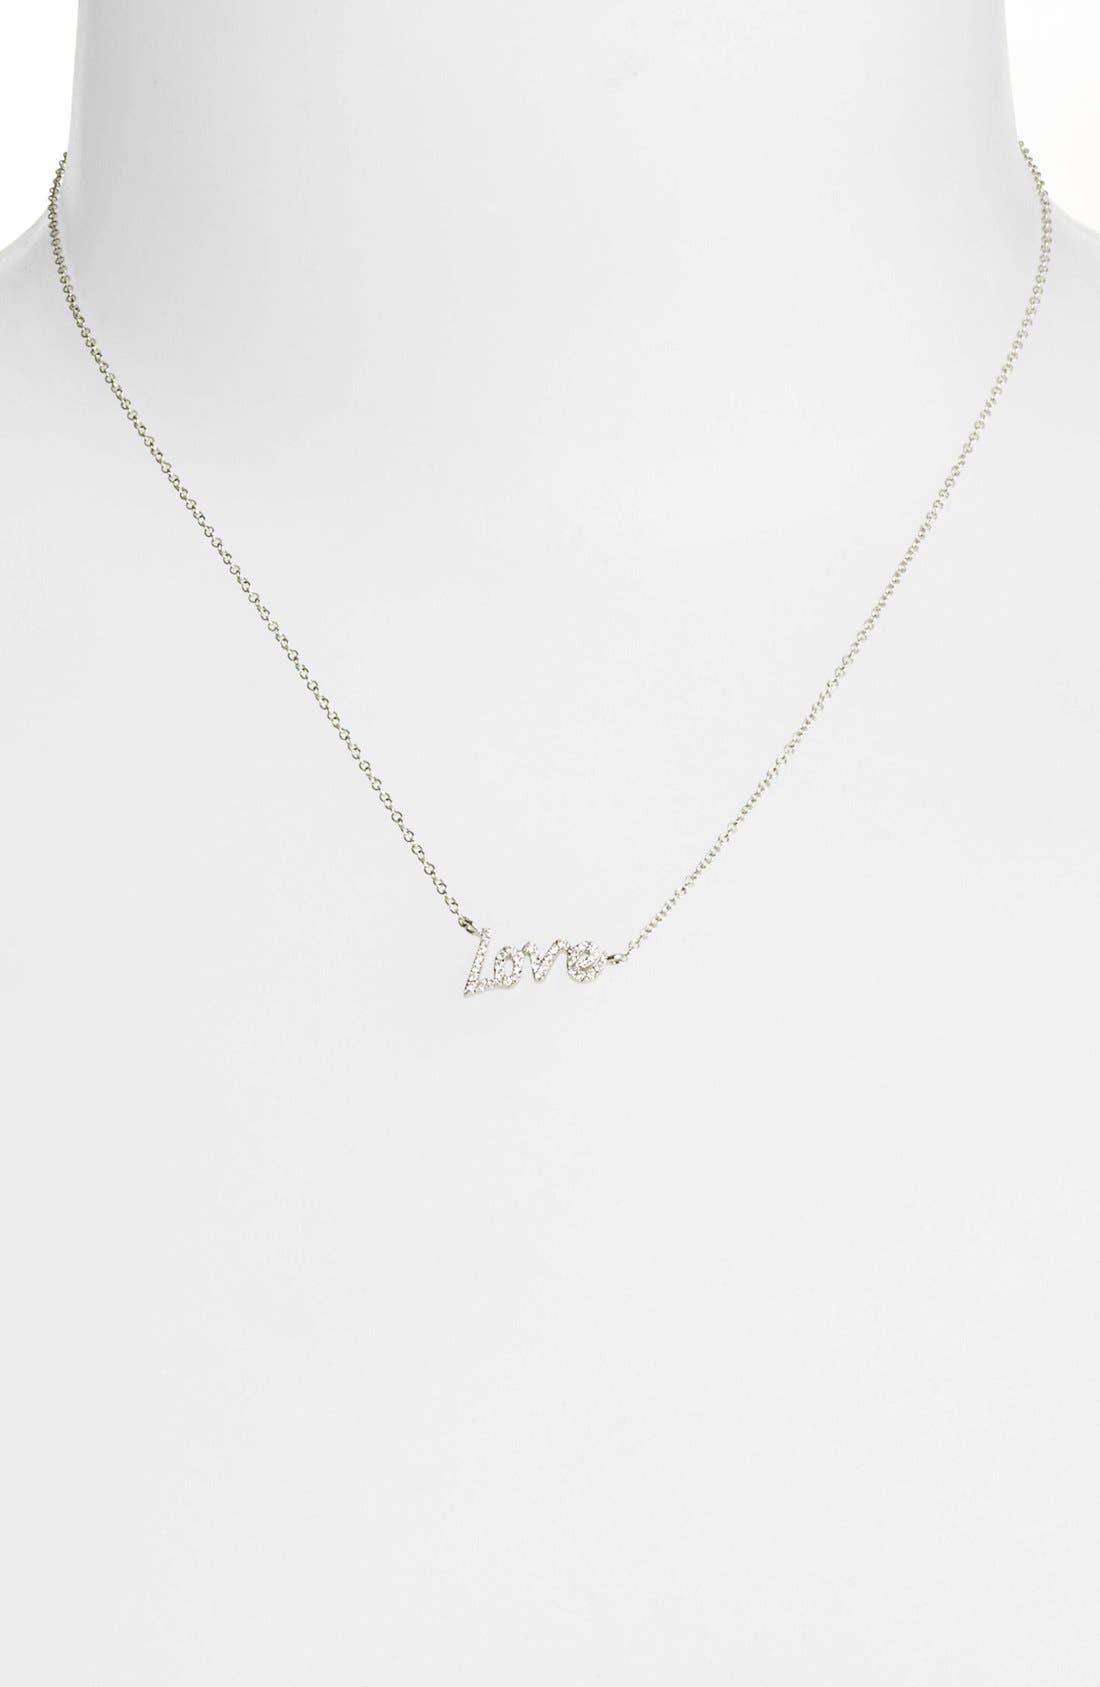 MeiraT Dazzling Diamond Love Pendant Necklace,                             Alternate thumbnail 6, color,                             WHITE GOLD